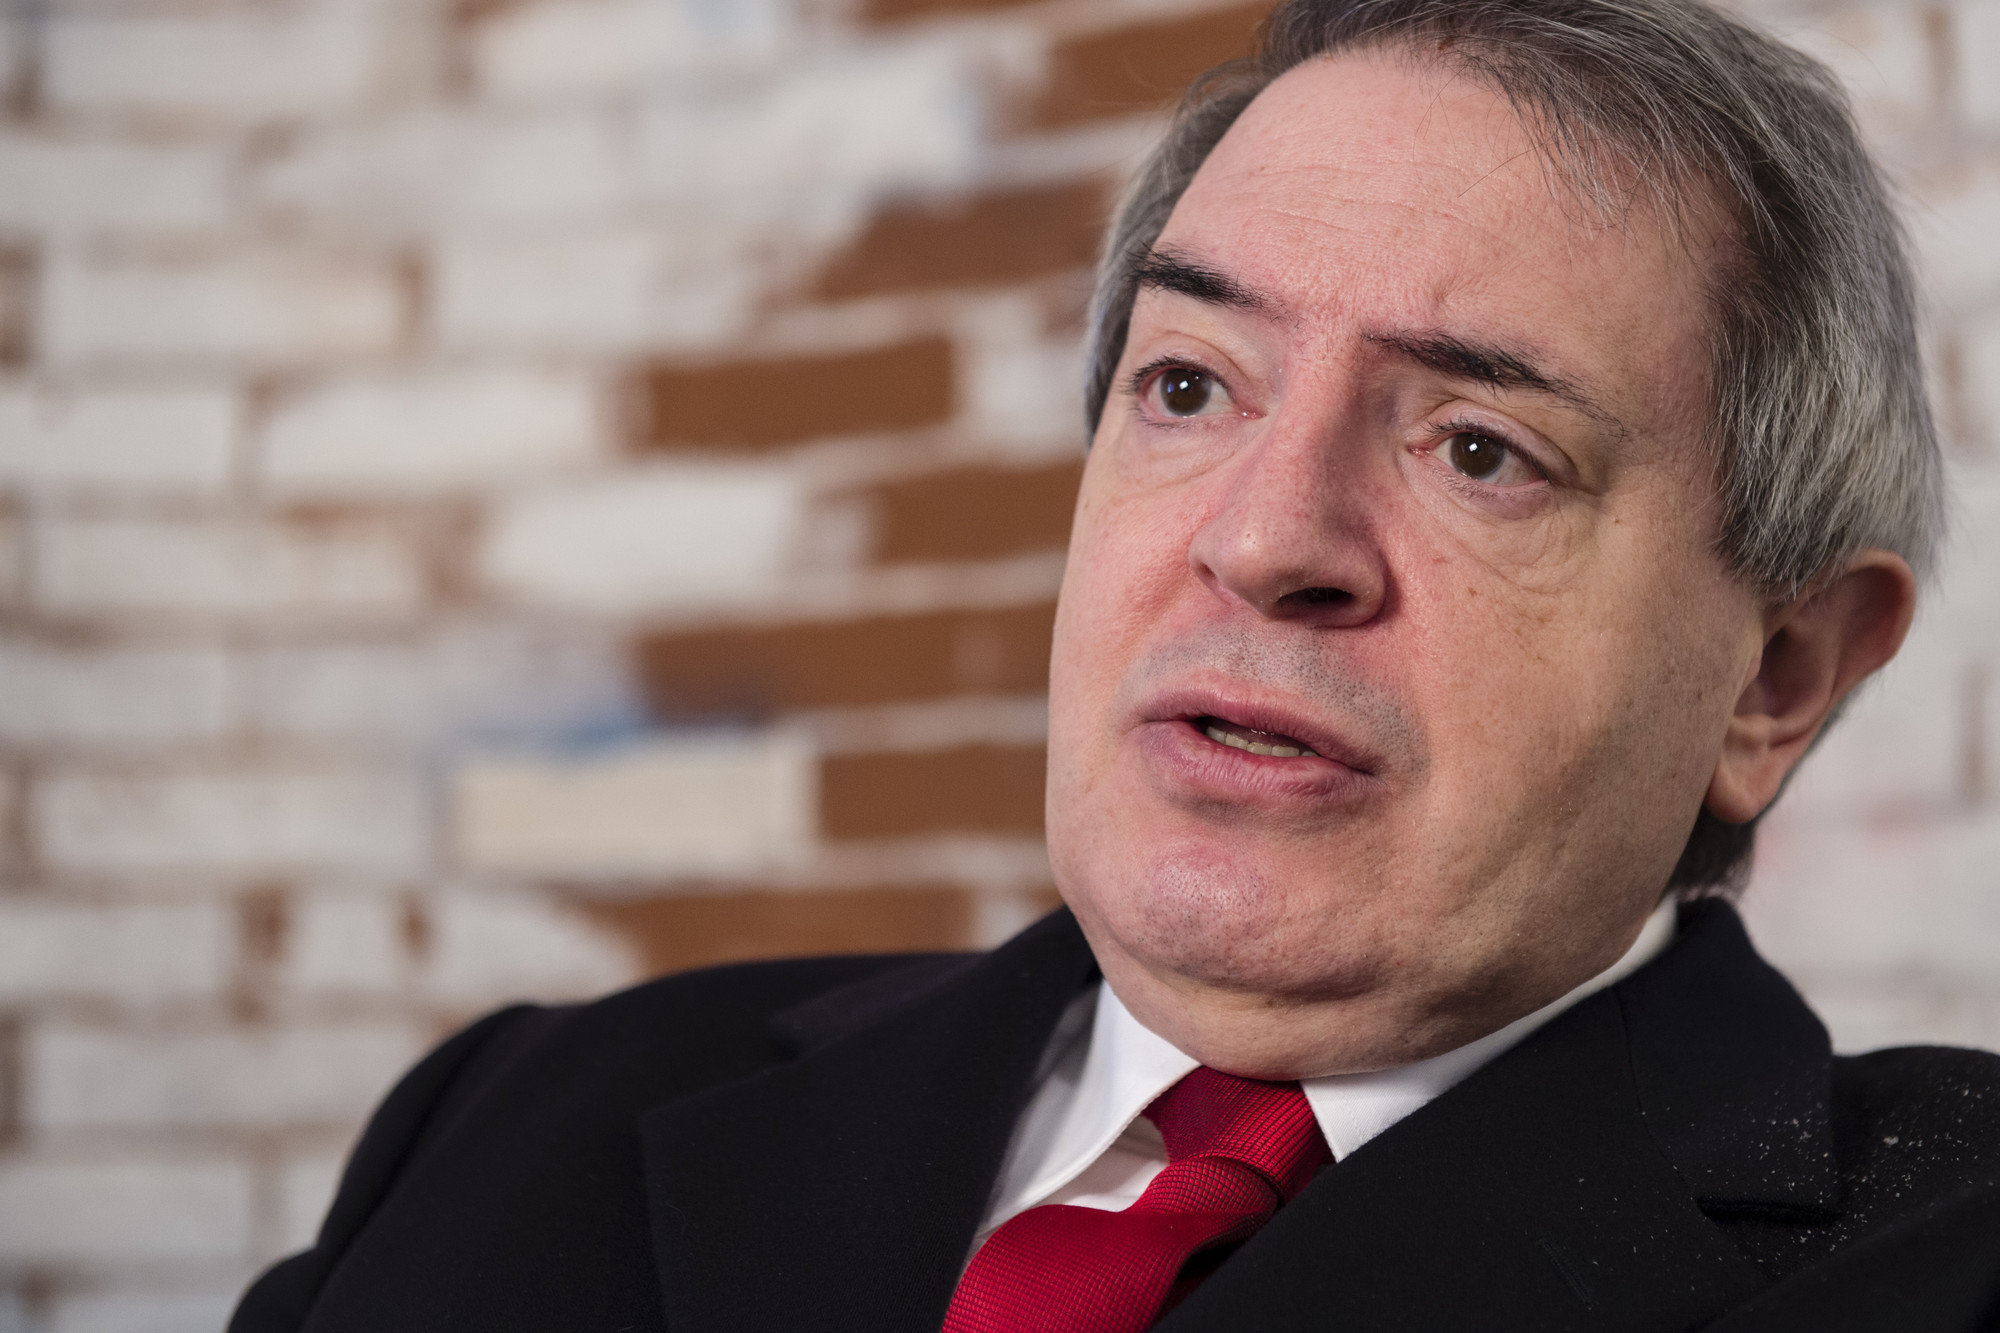 Prof. Pier Luigi Guiducci